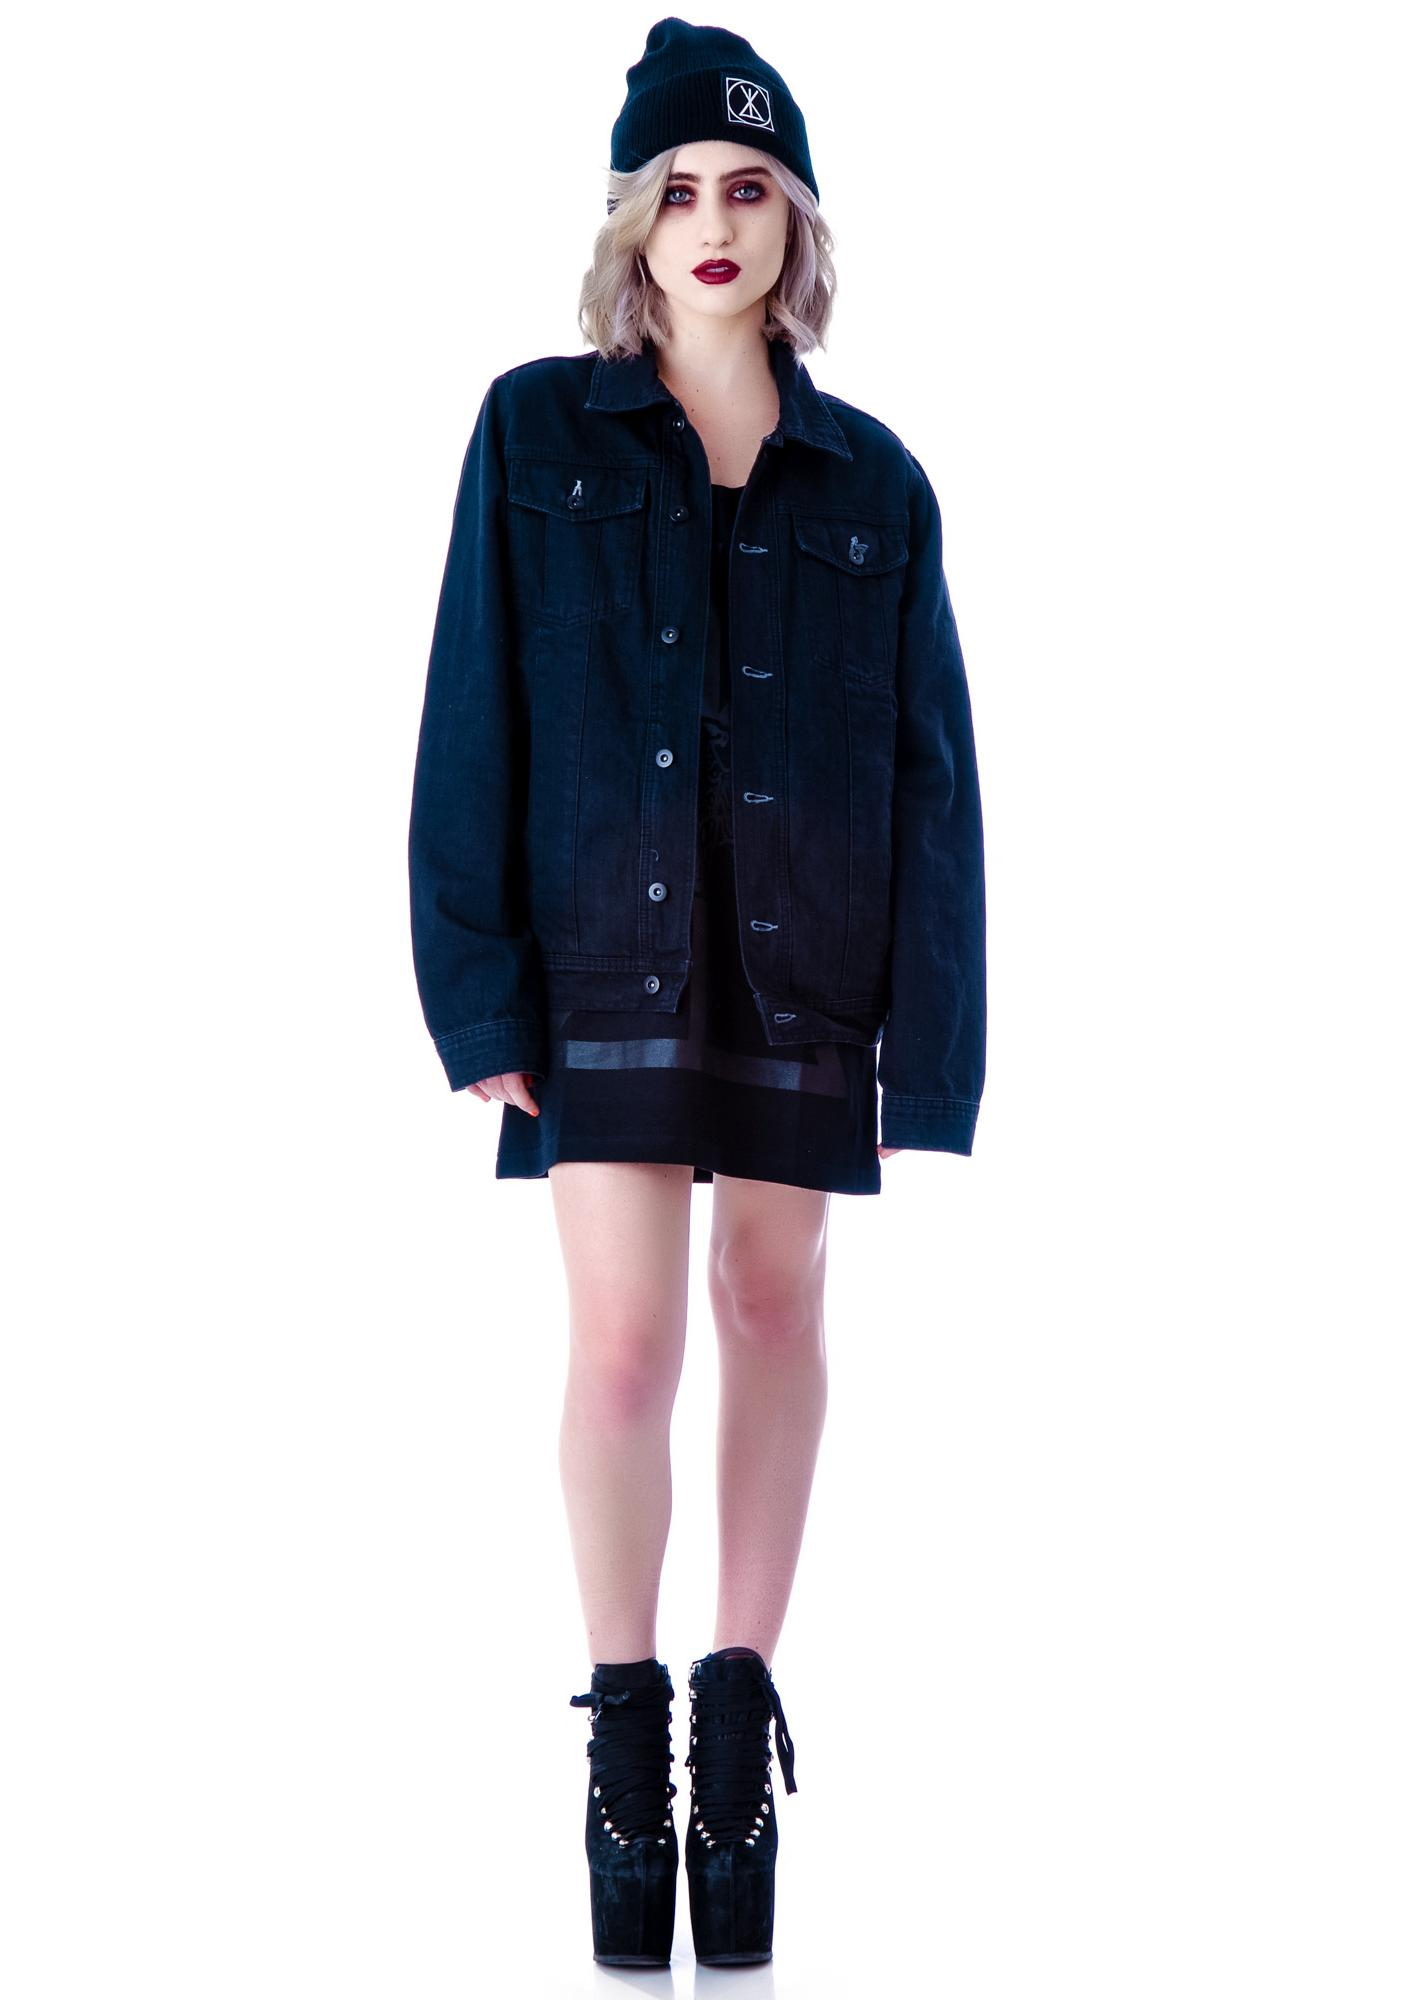 Inverted Cross Denim Jacket